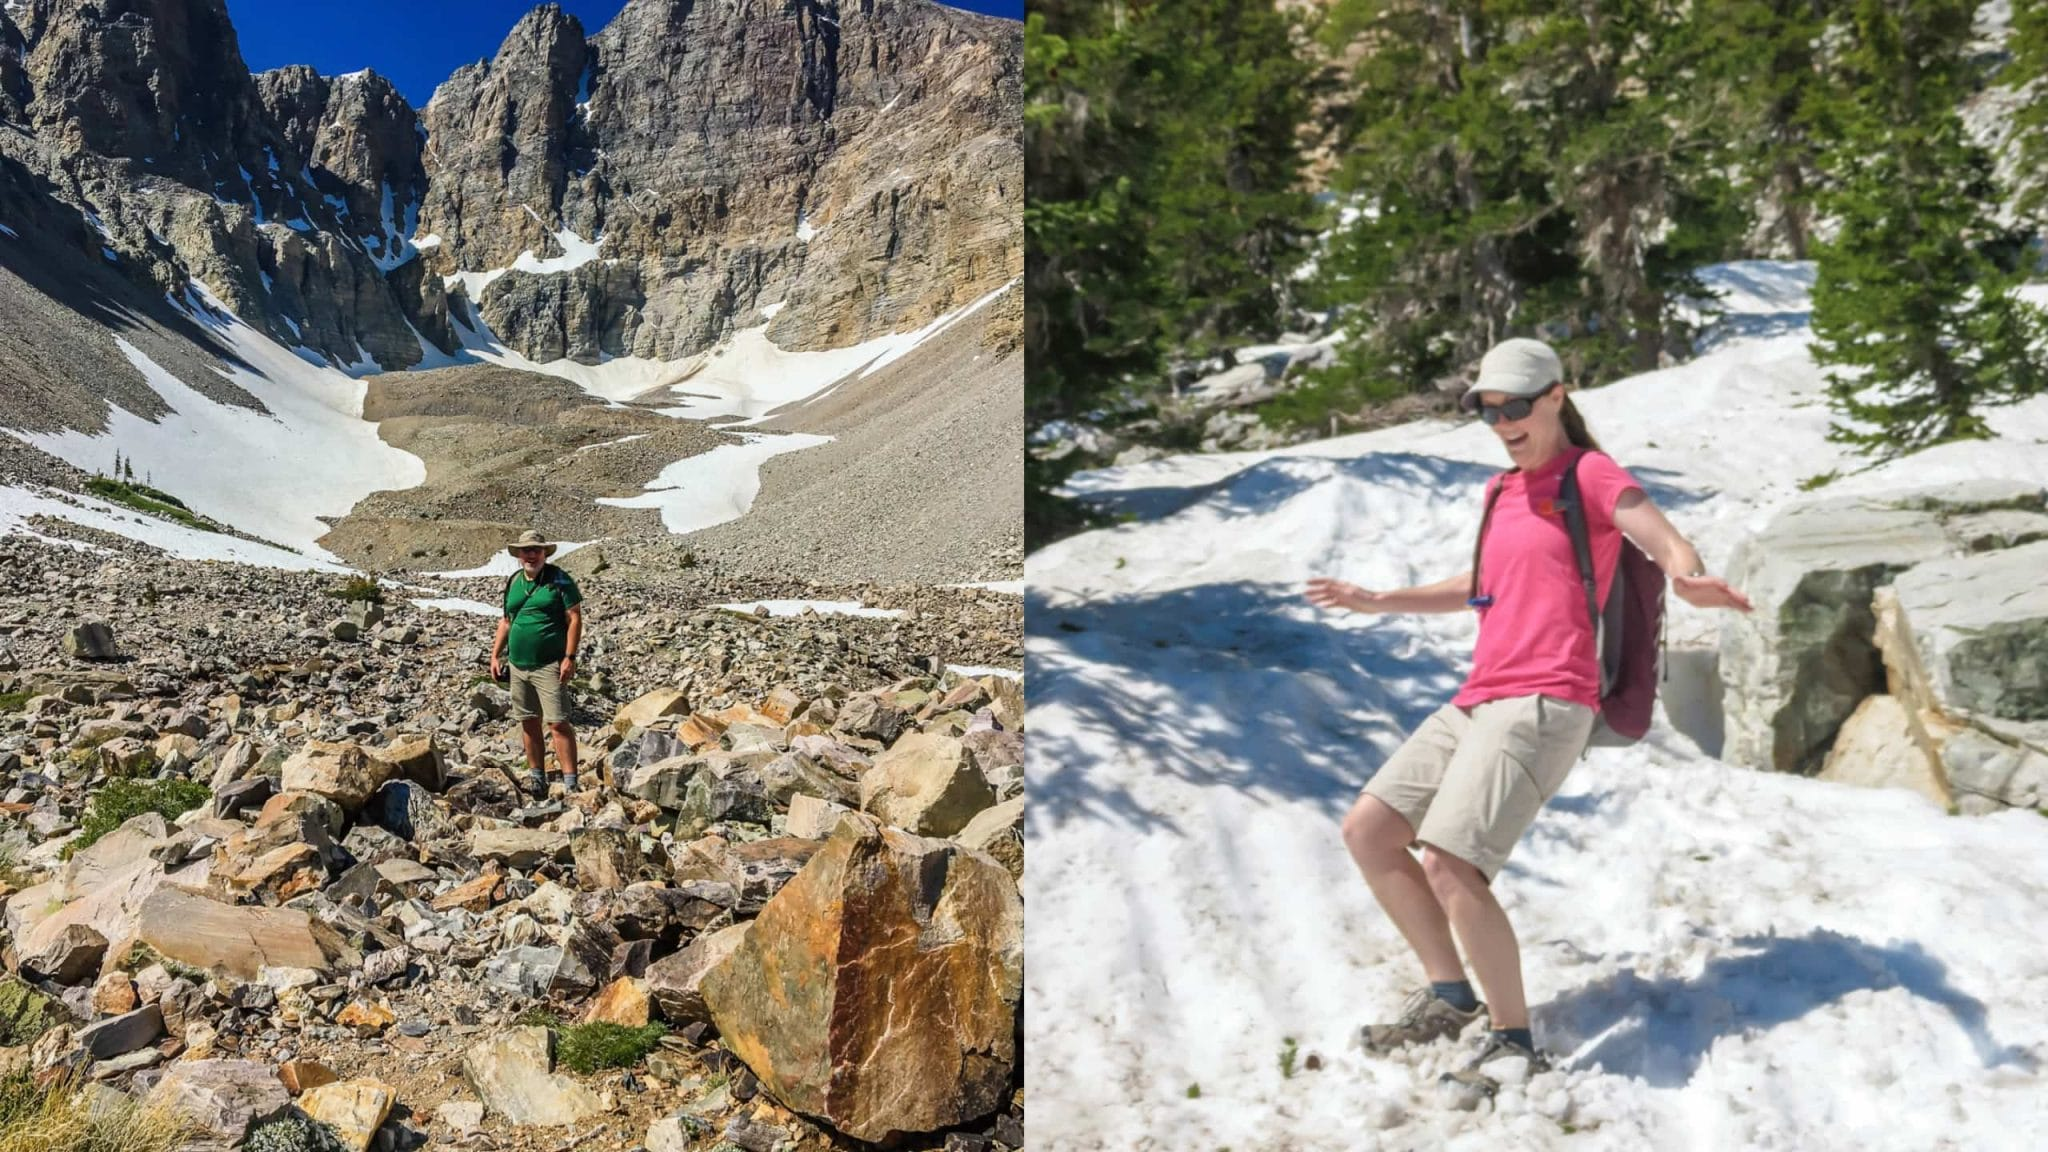 Grant and Bonnie traverse Glacier Trail in Great Basin NP.